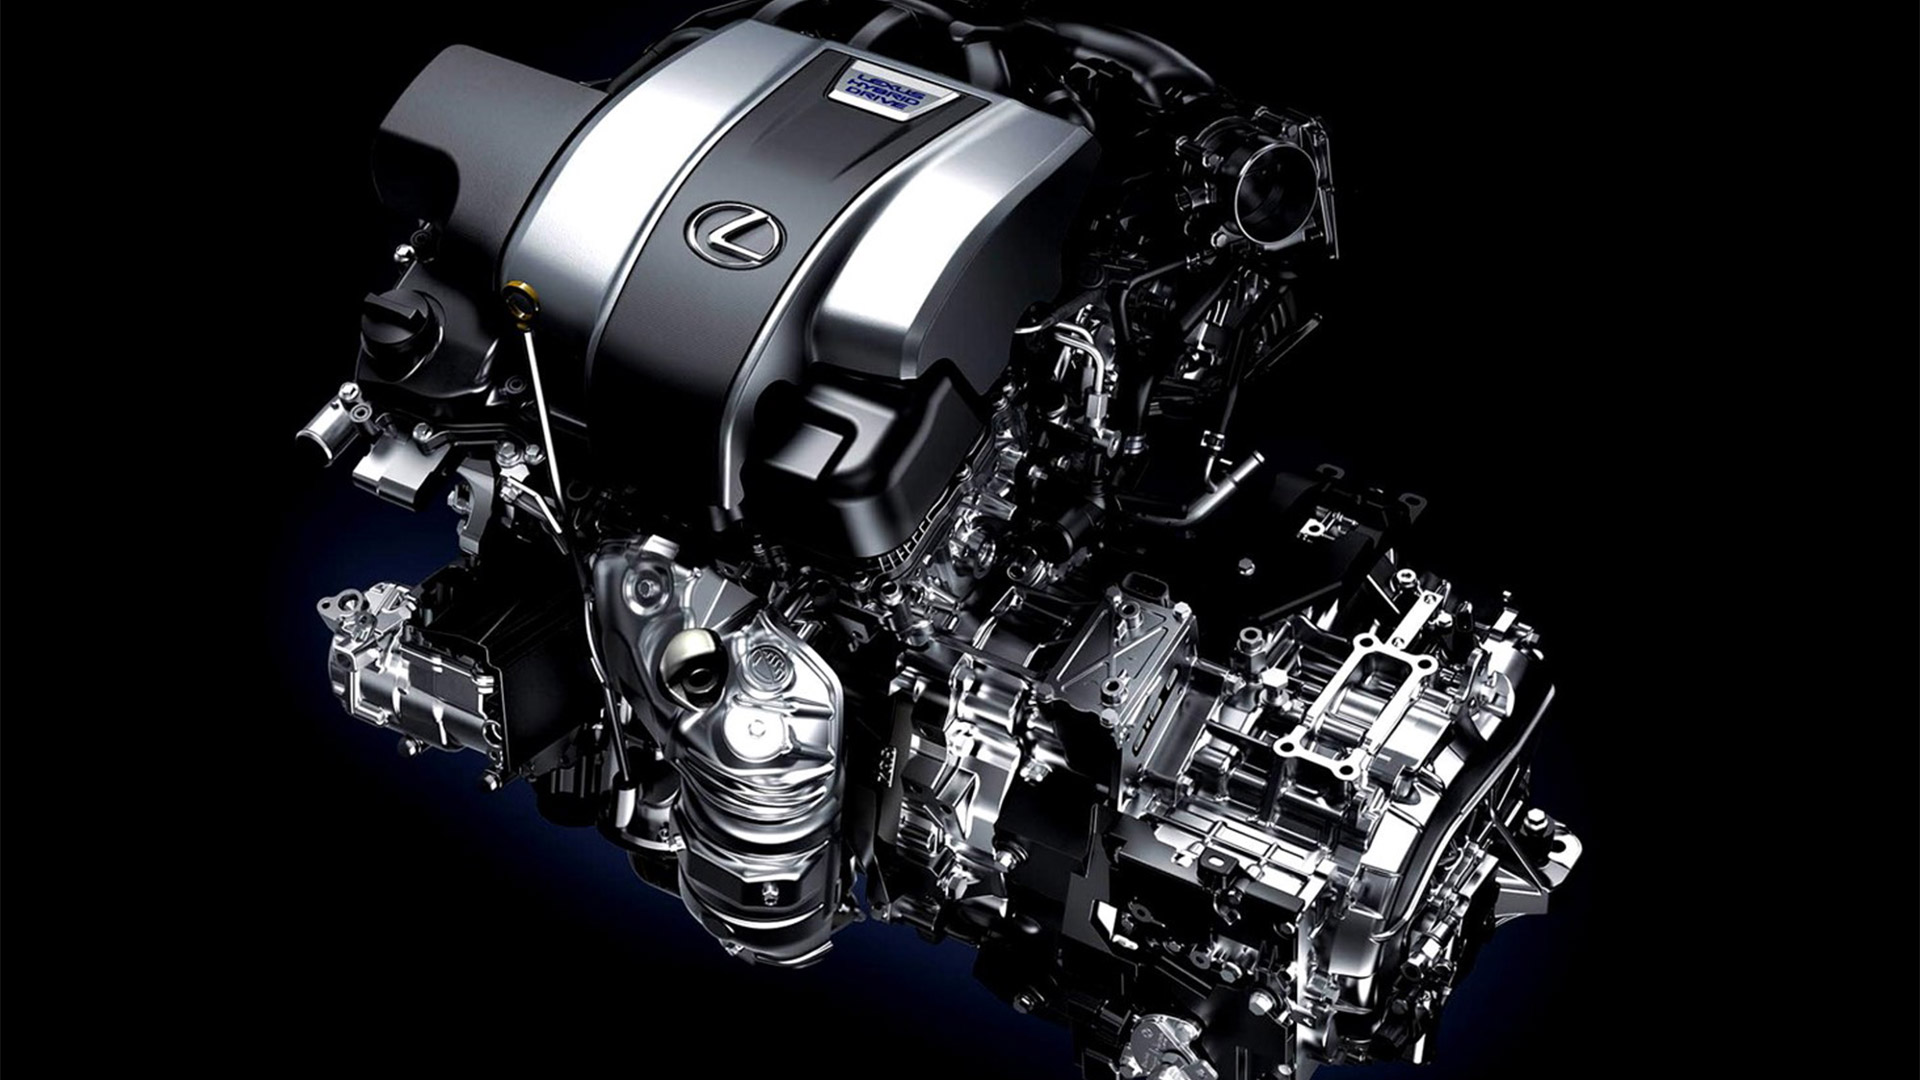 06 2019 020 Lexus RX pionier 1920x1080 galerij